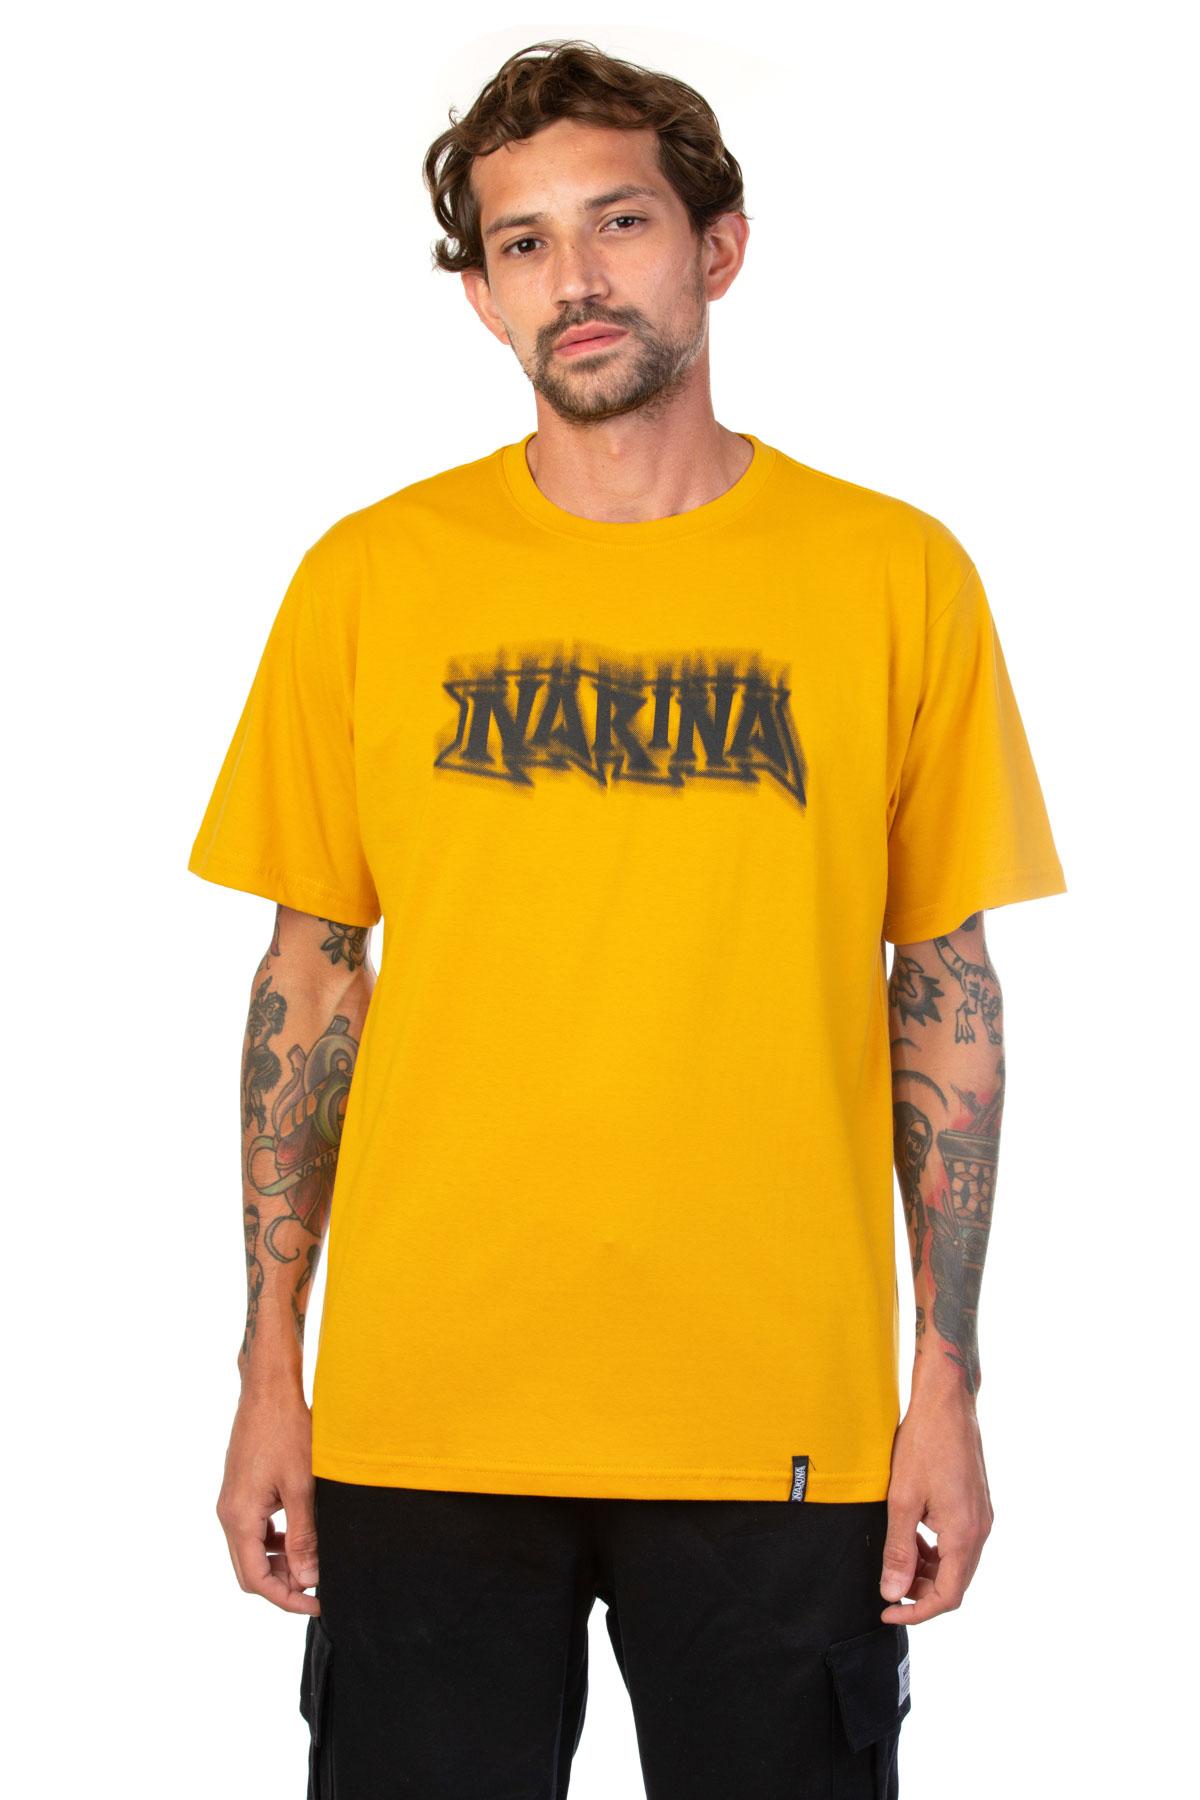 Camiseta Vulto Narina Skate